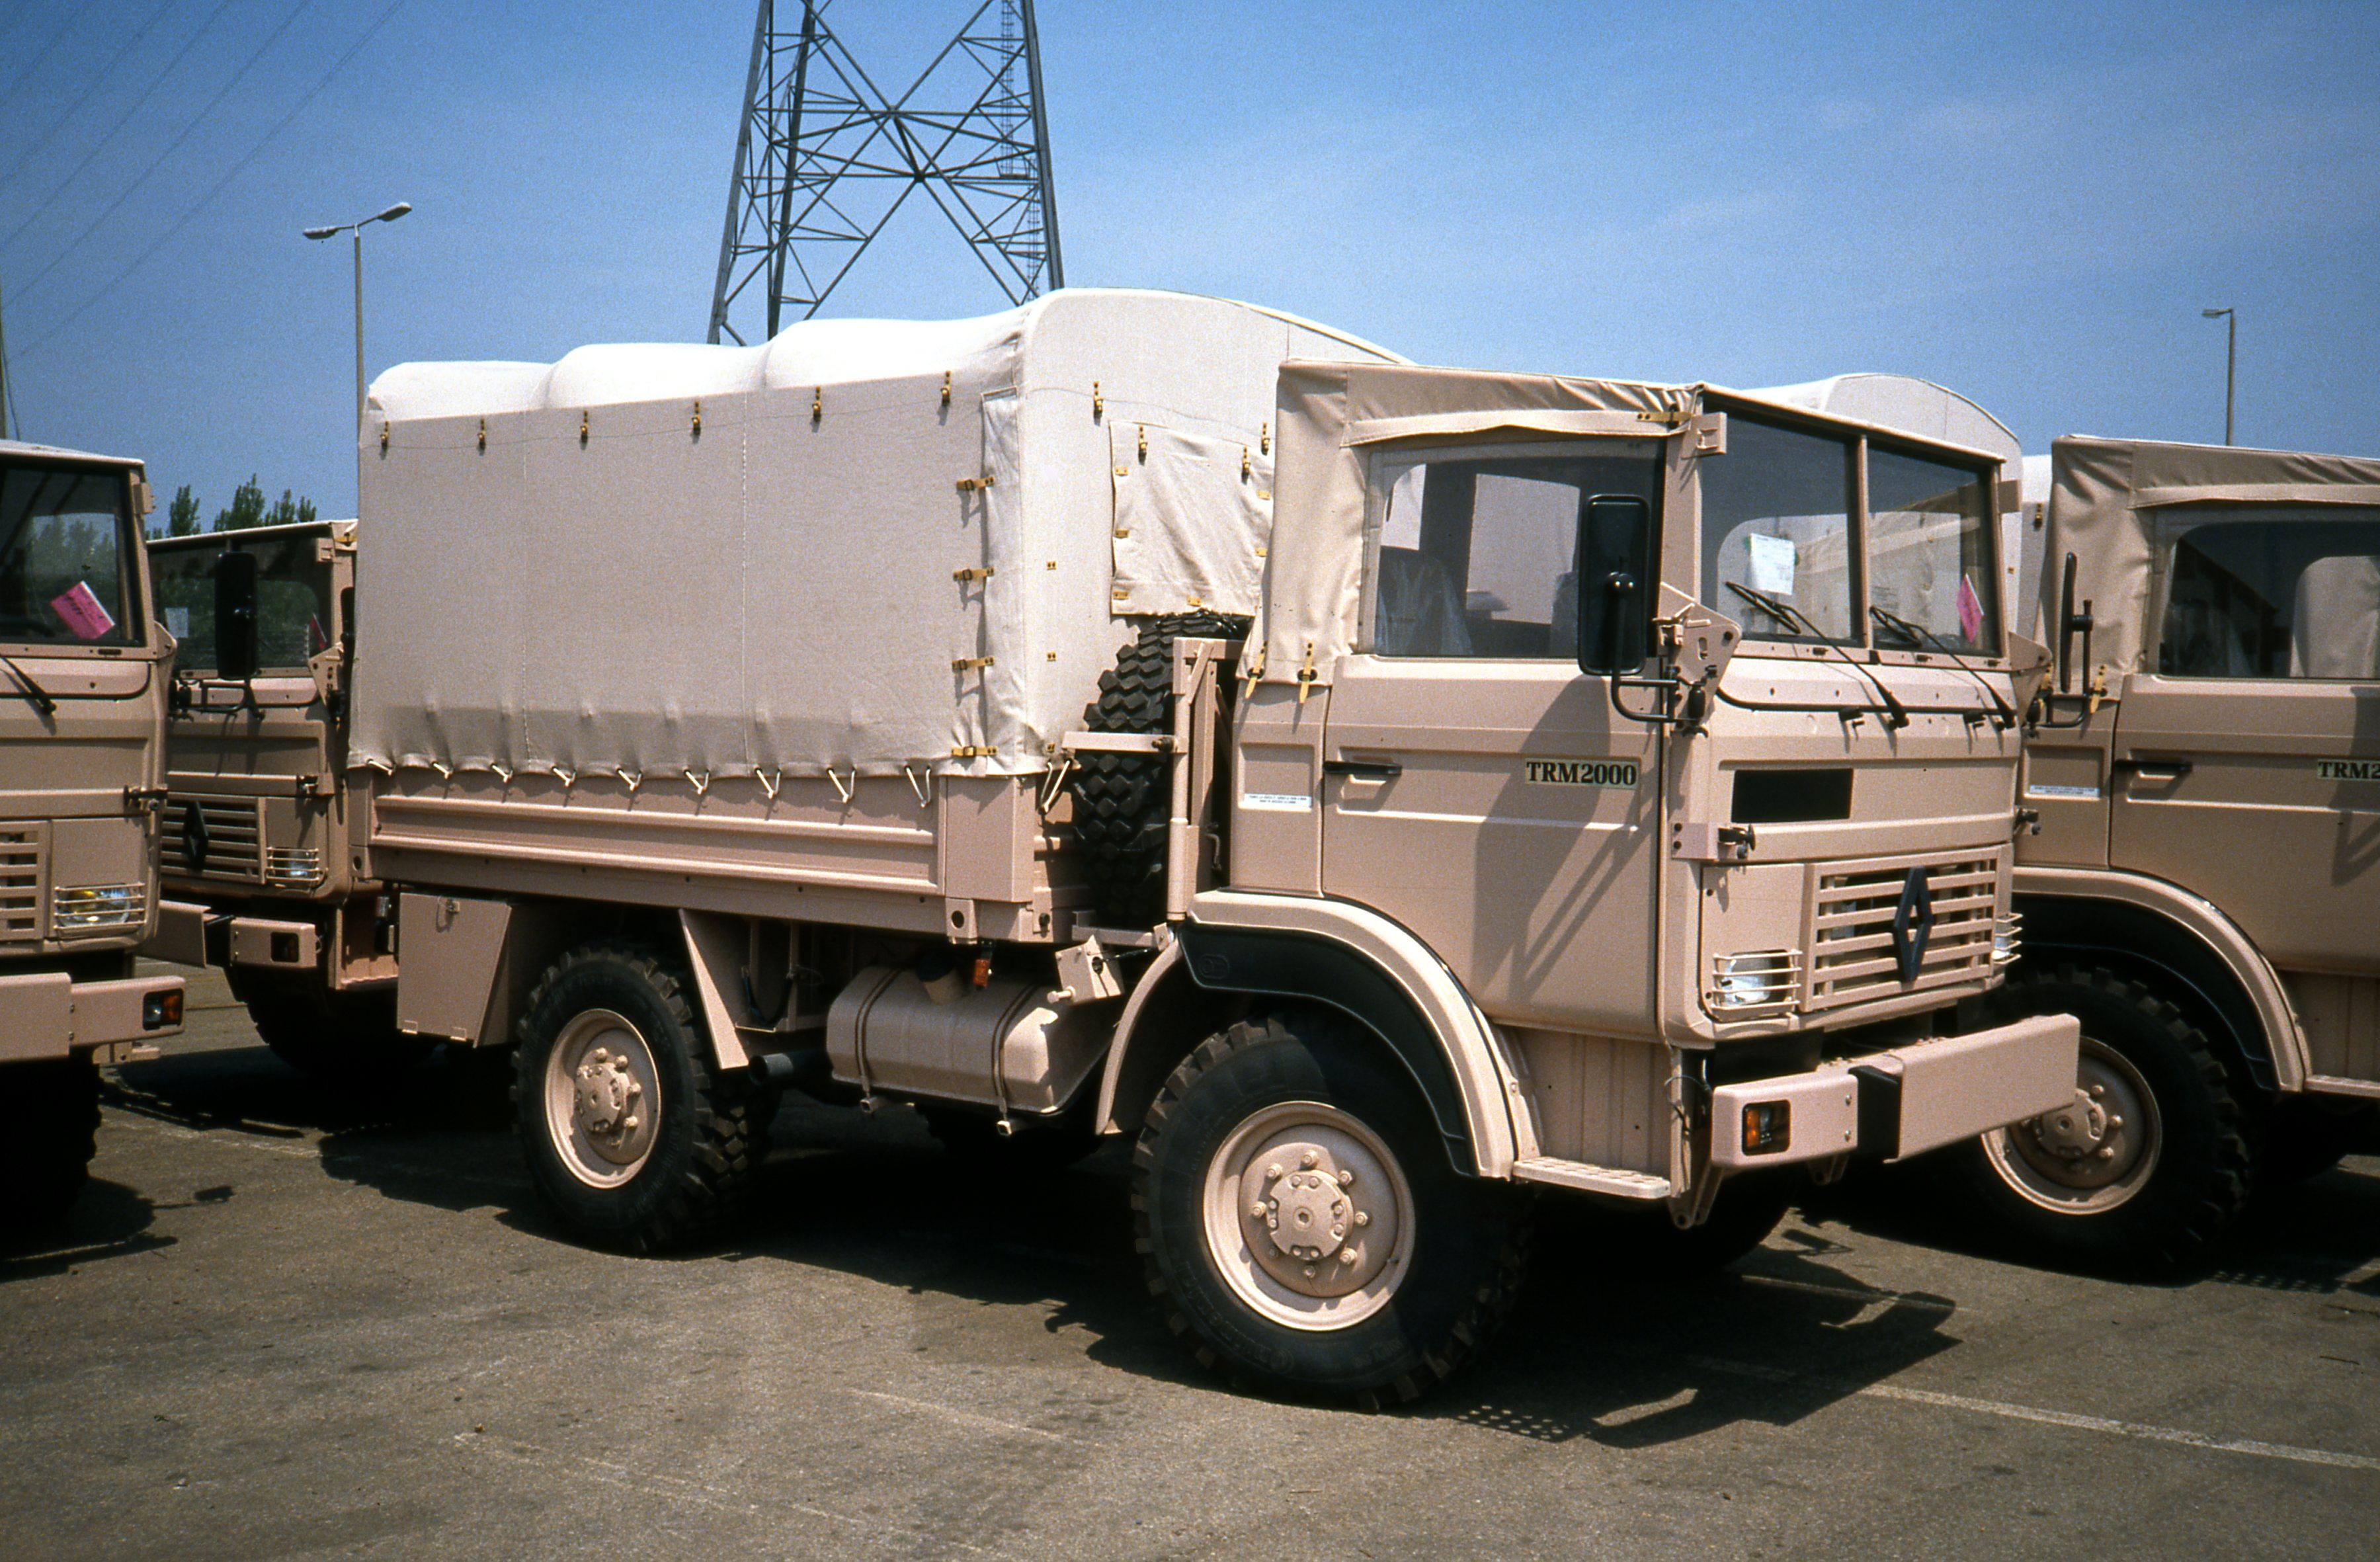 Photos - Logistique et Camions / Logistics and Trucks - Page 6 34872138656_c51b2bed13_o